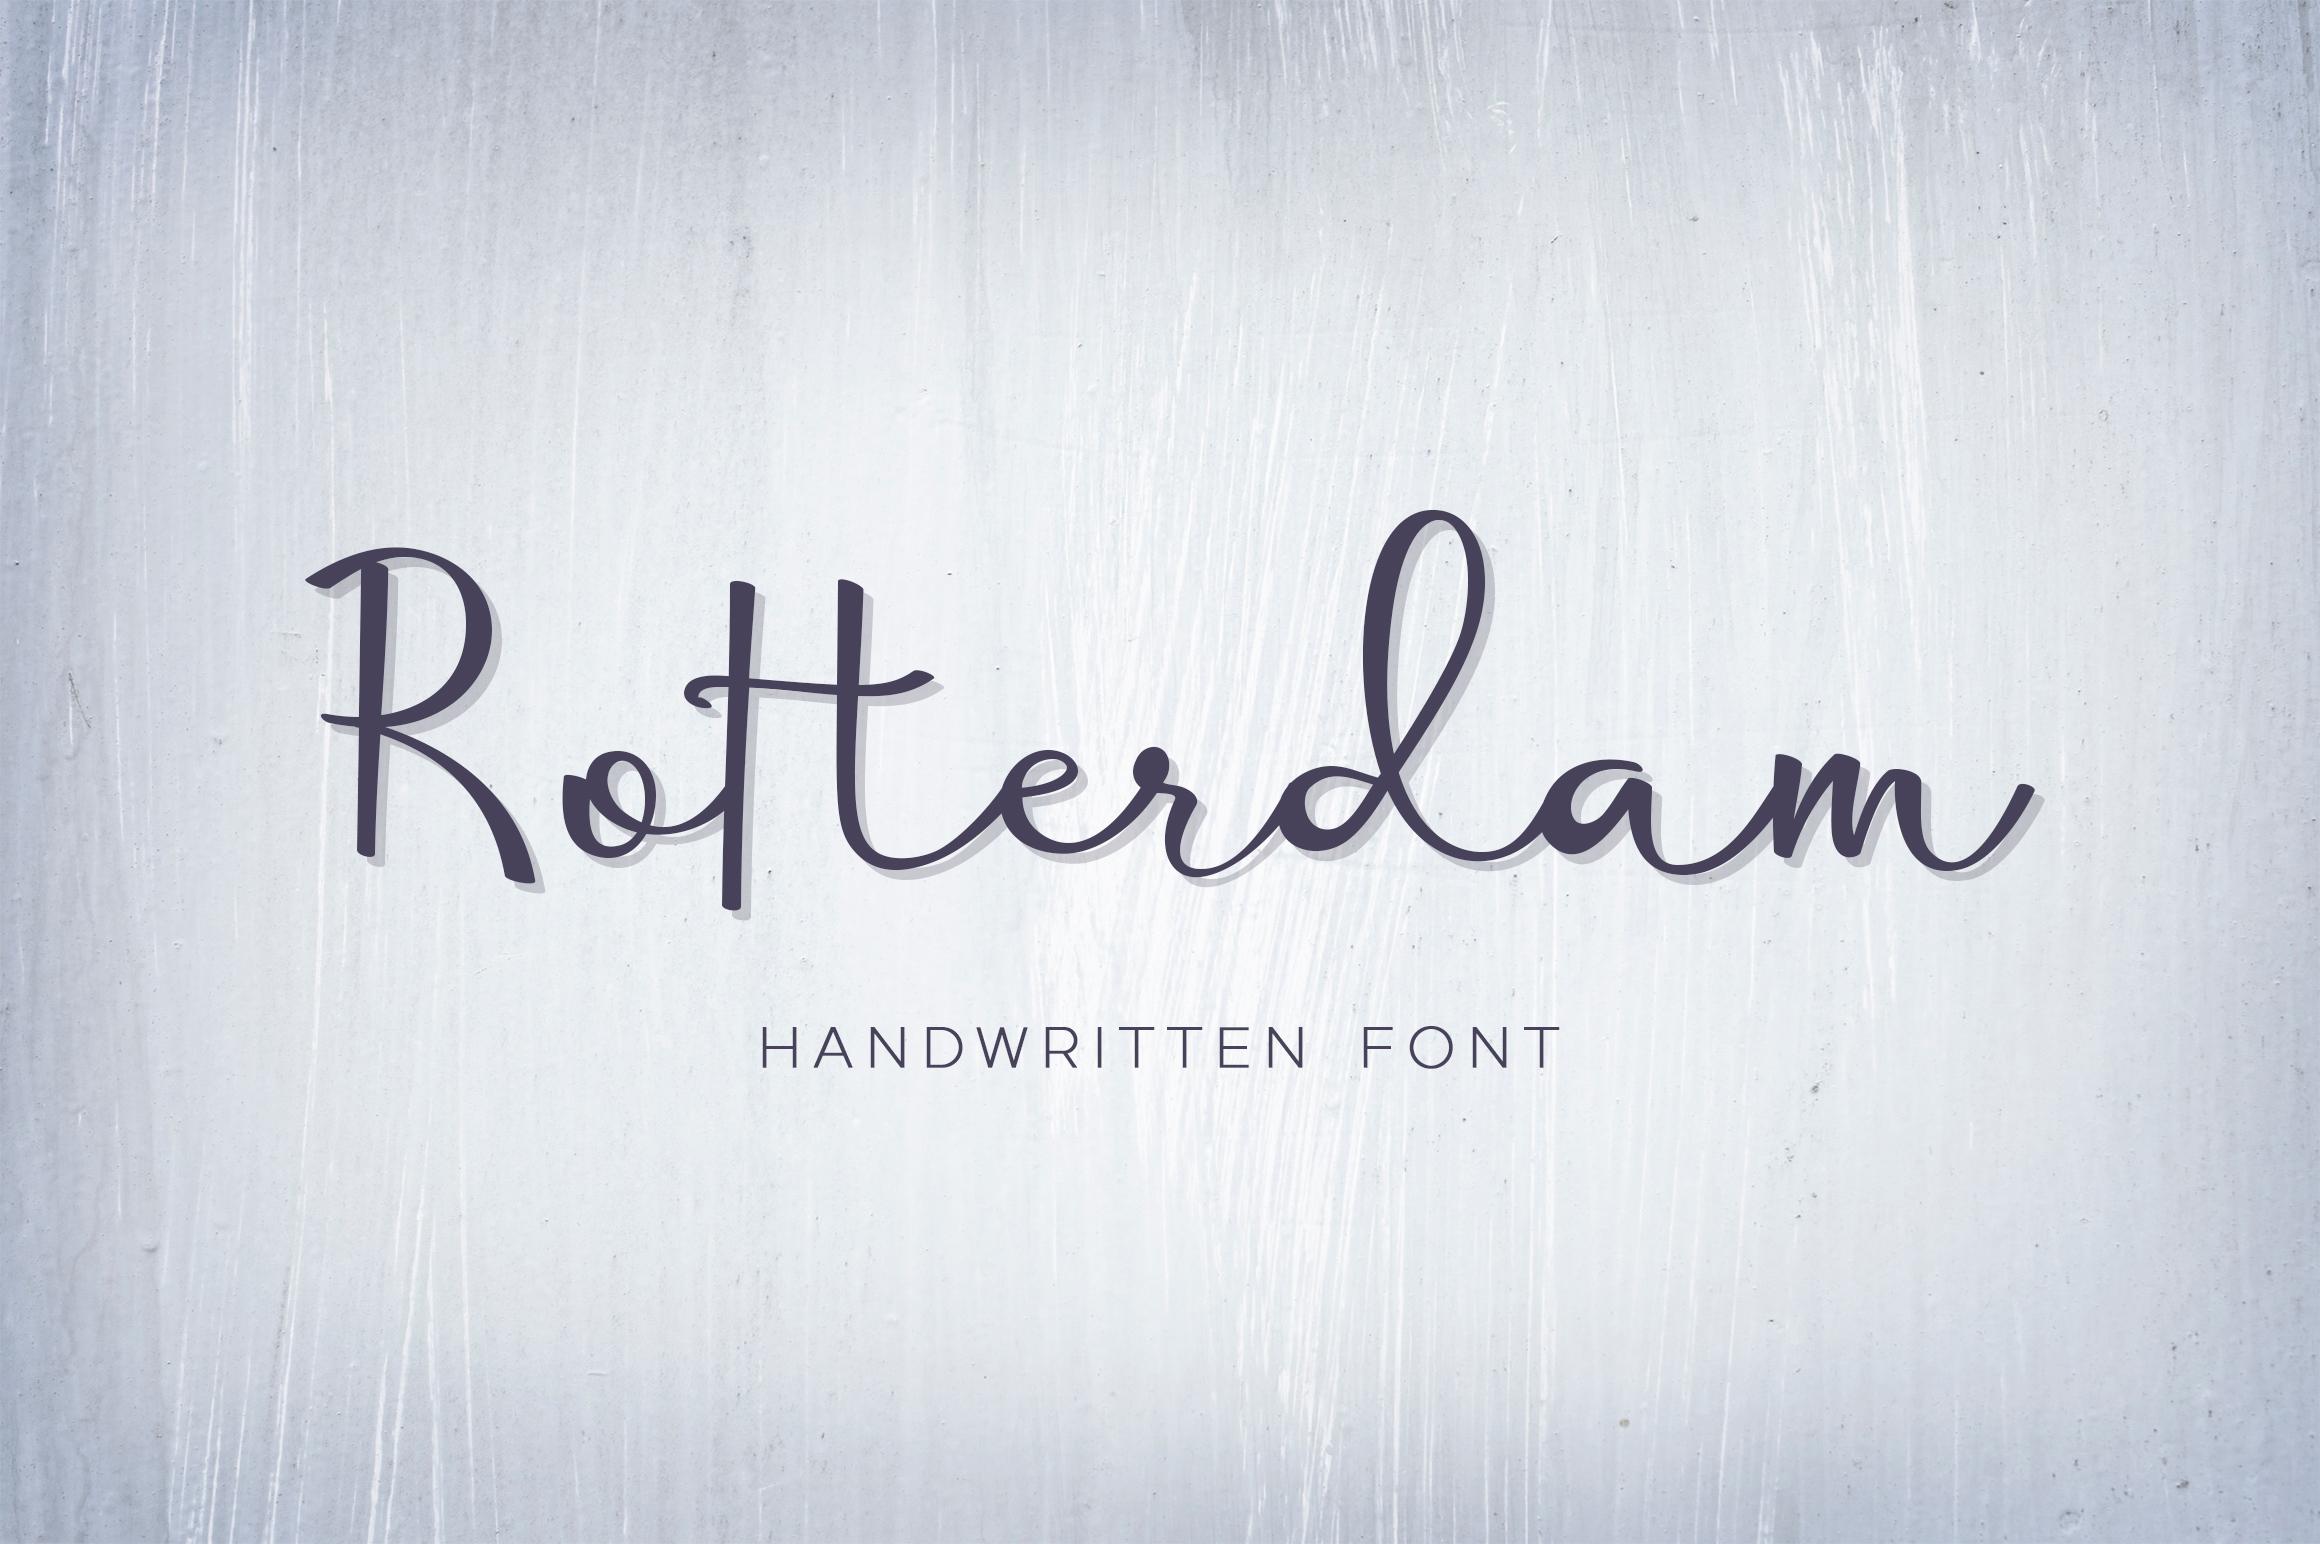 Rotterdam - handwritten calligraphy font example image 1